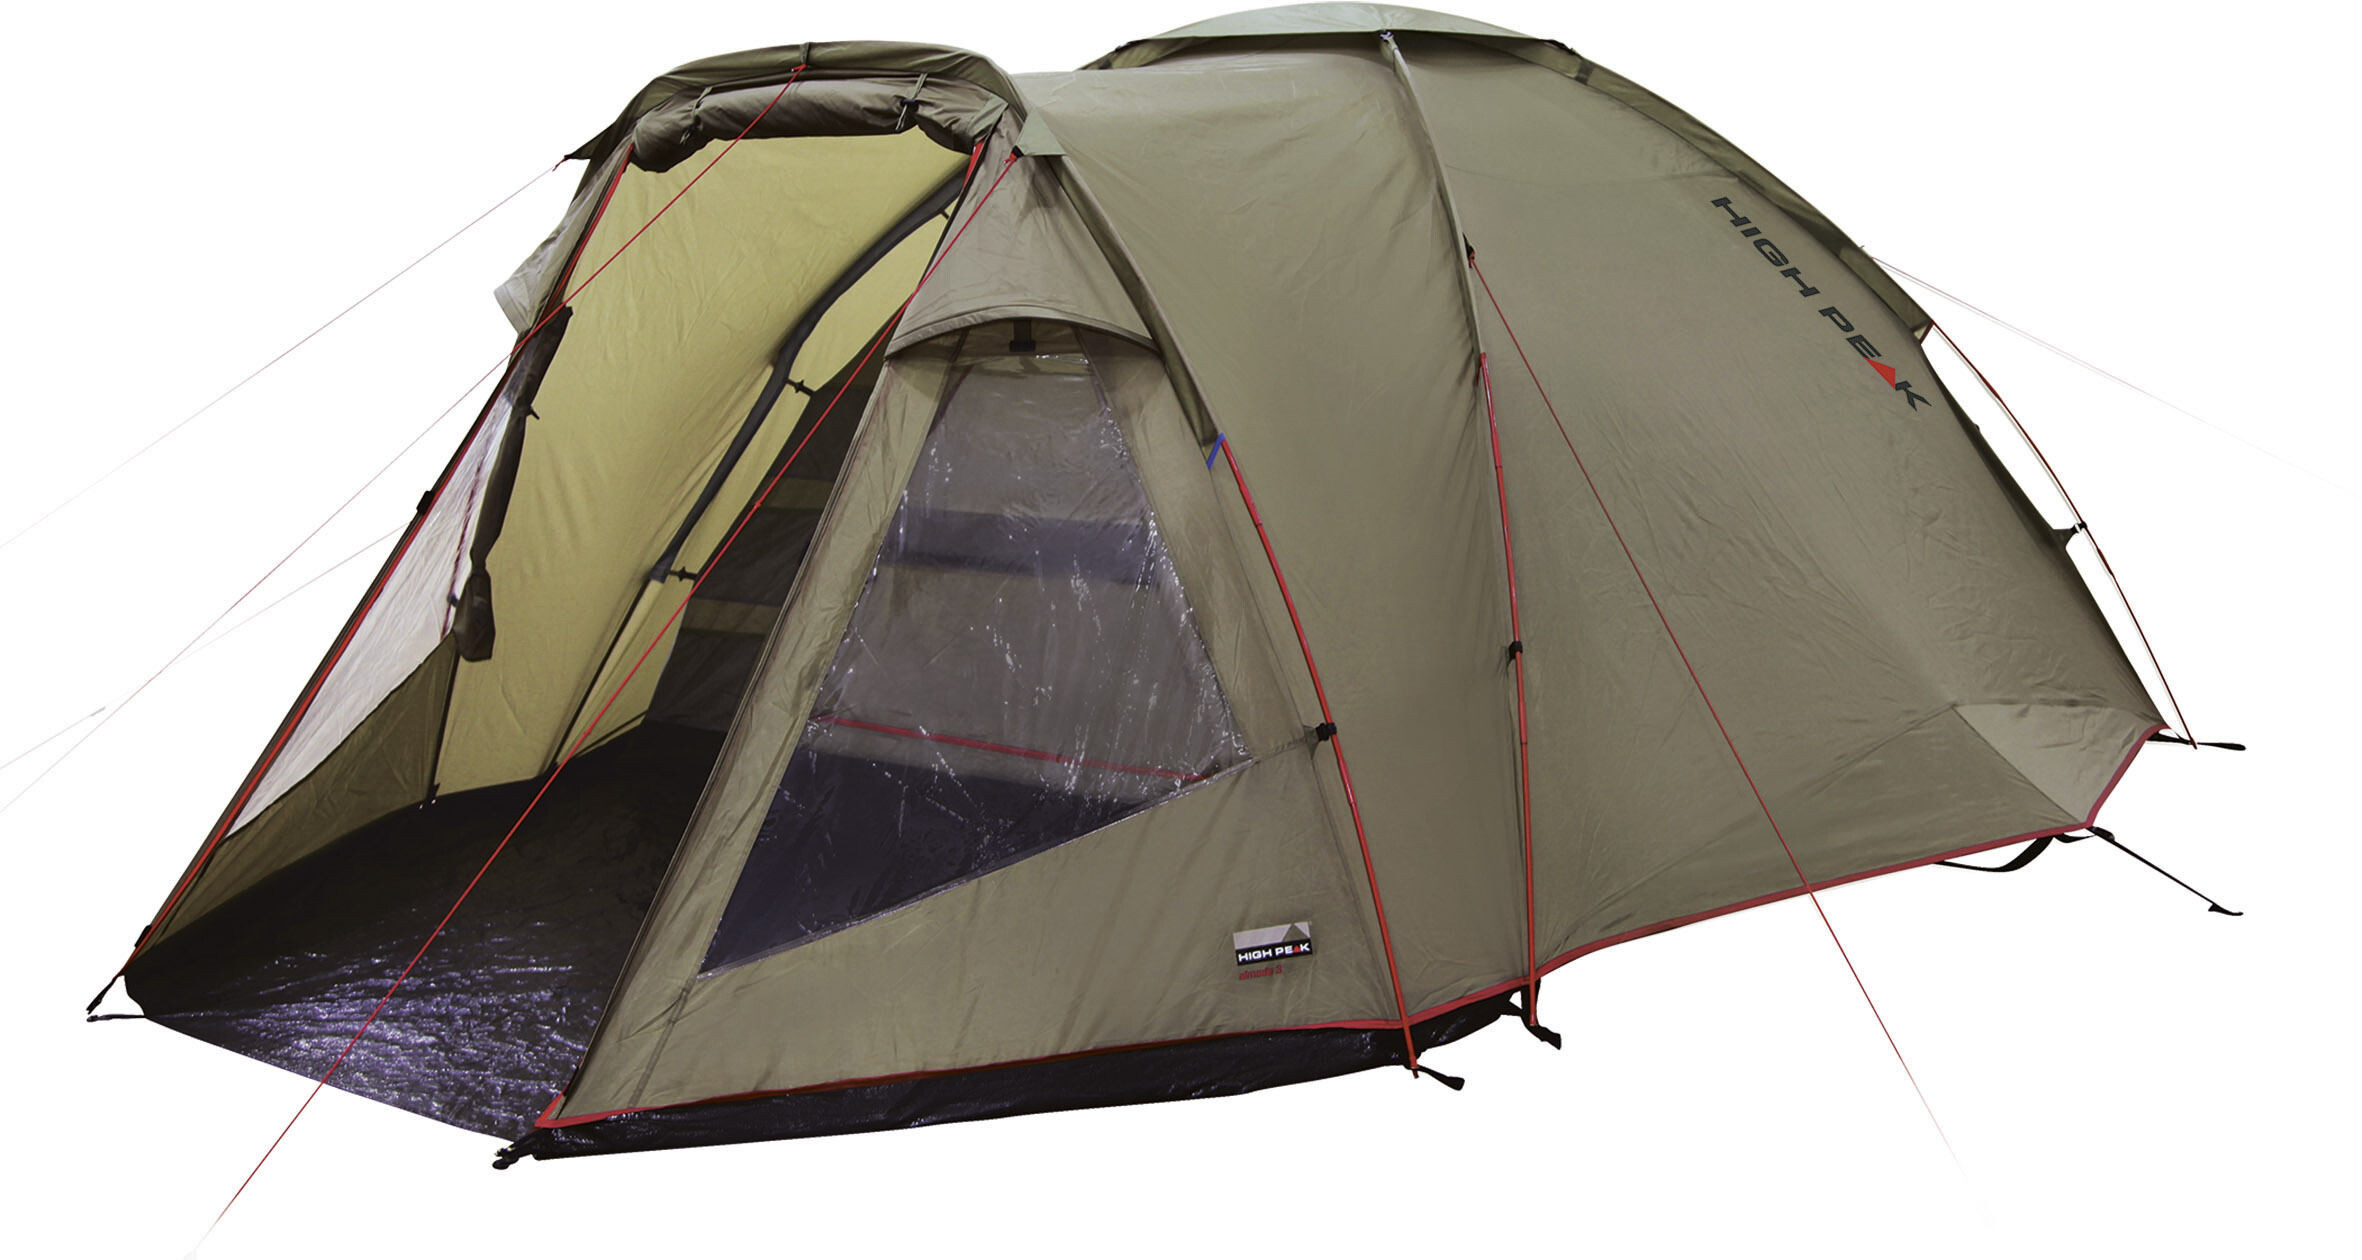 Camp4 Klettergurt : High peak almada 4 tent tuscany oliv campz.de